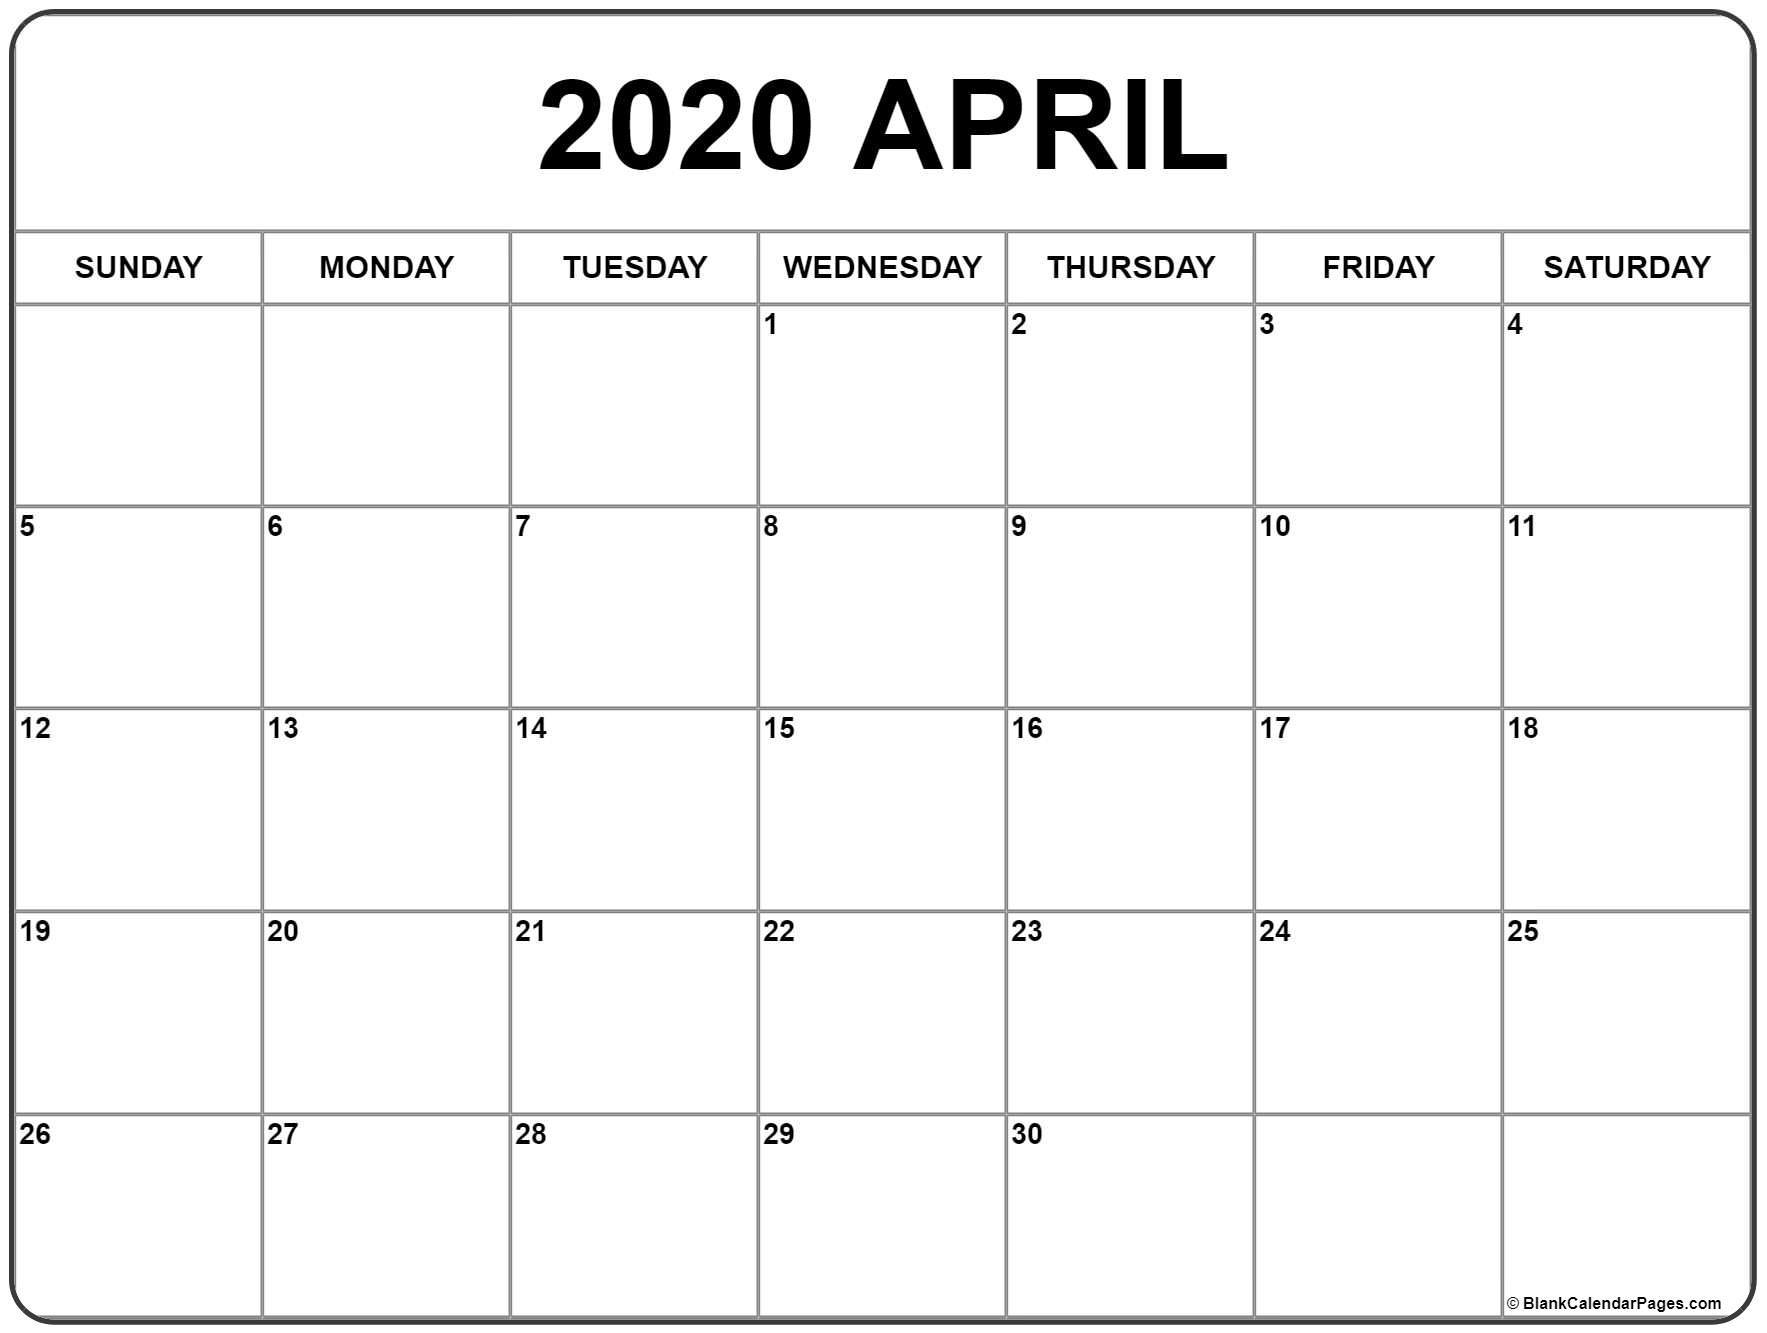 April 2020 Calendar | Free Printable Monthly Calendars-2020 Calendar Template Ms Word